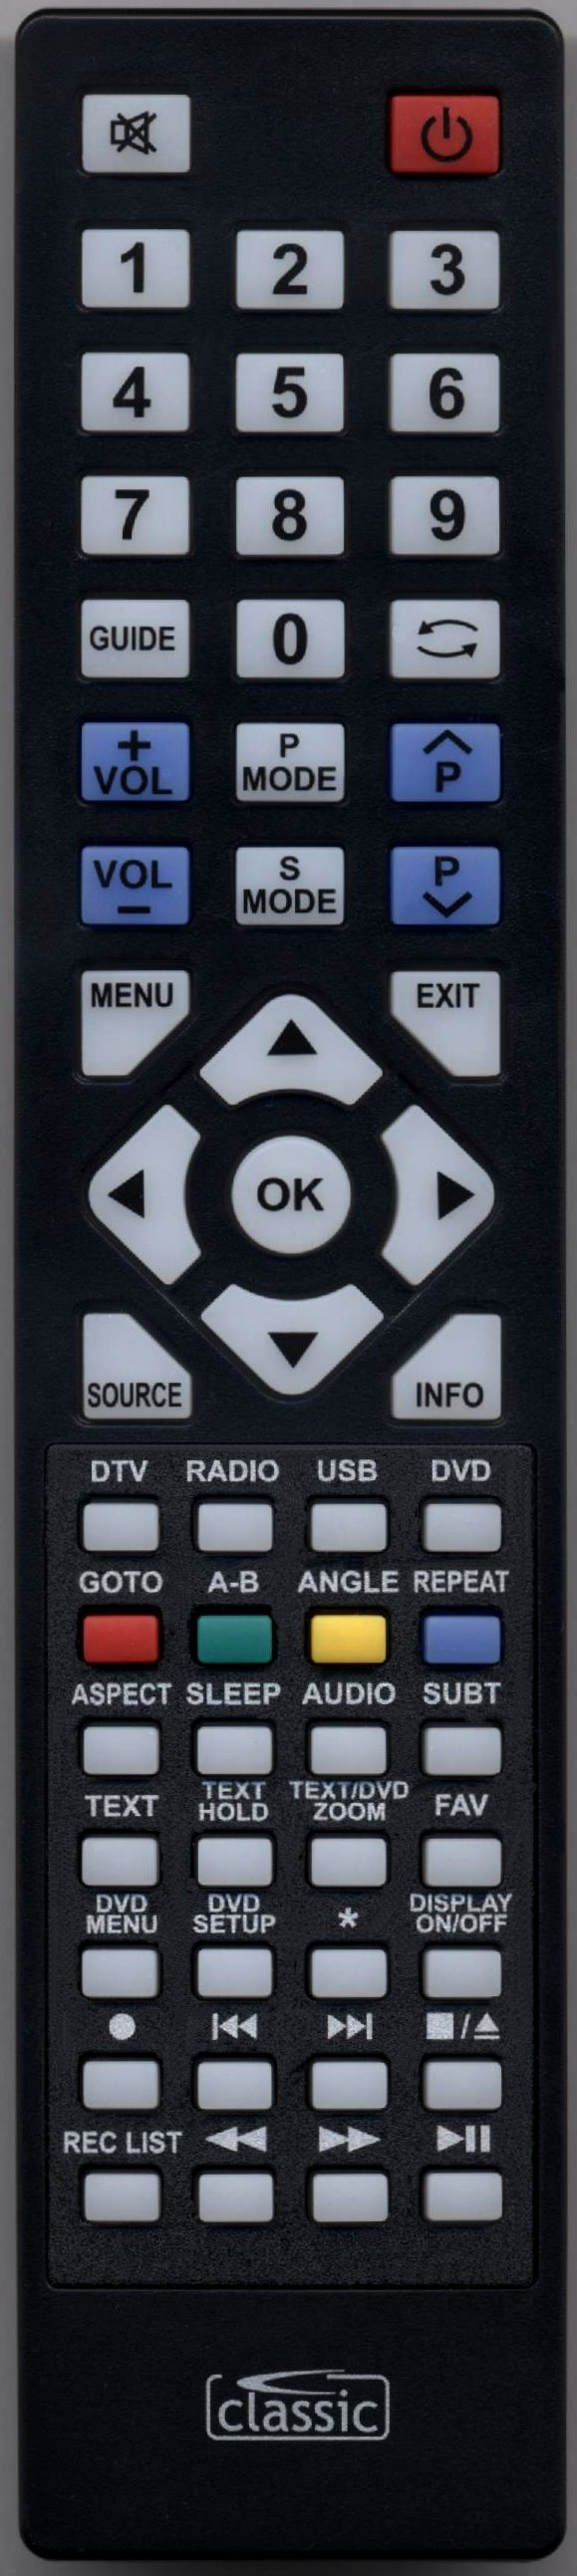 BLAUPUNKT 32-147I-GB-5B-HKUP-UK Remote Control Alternative